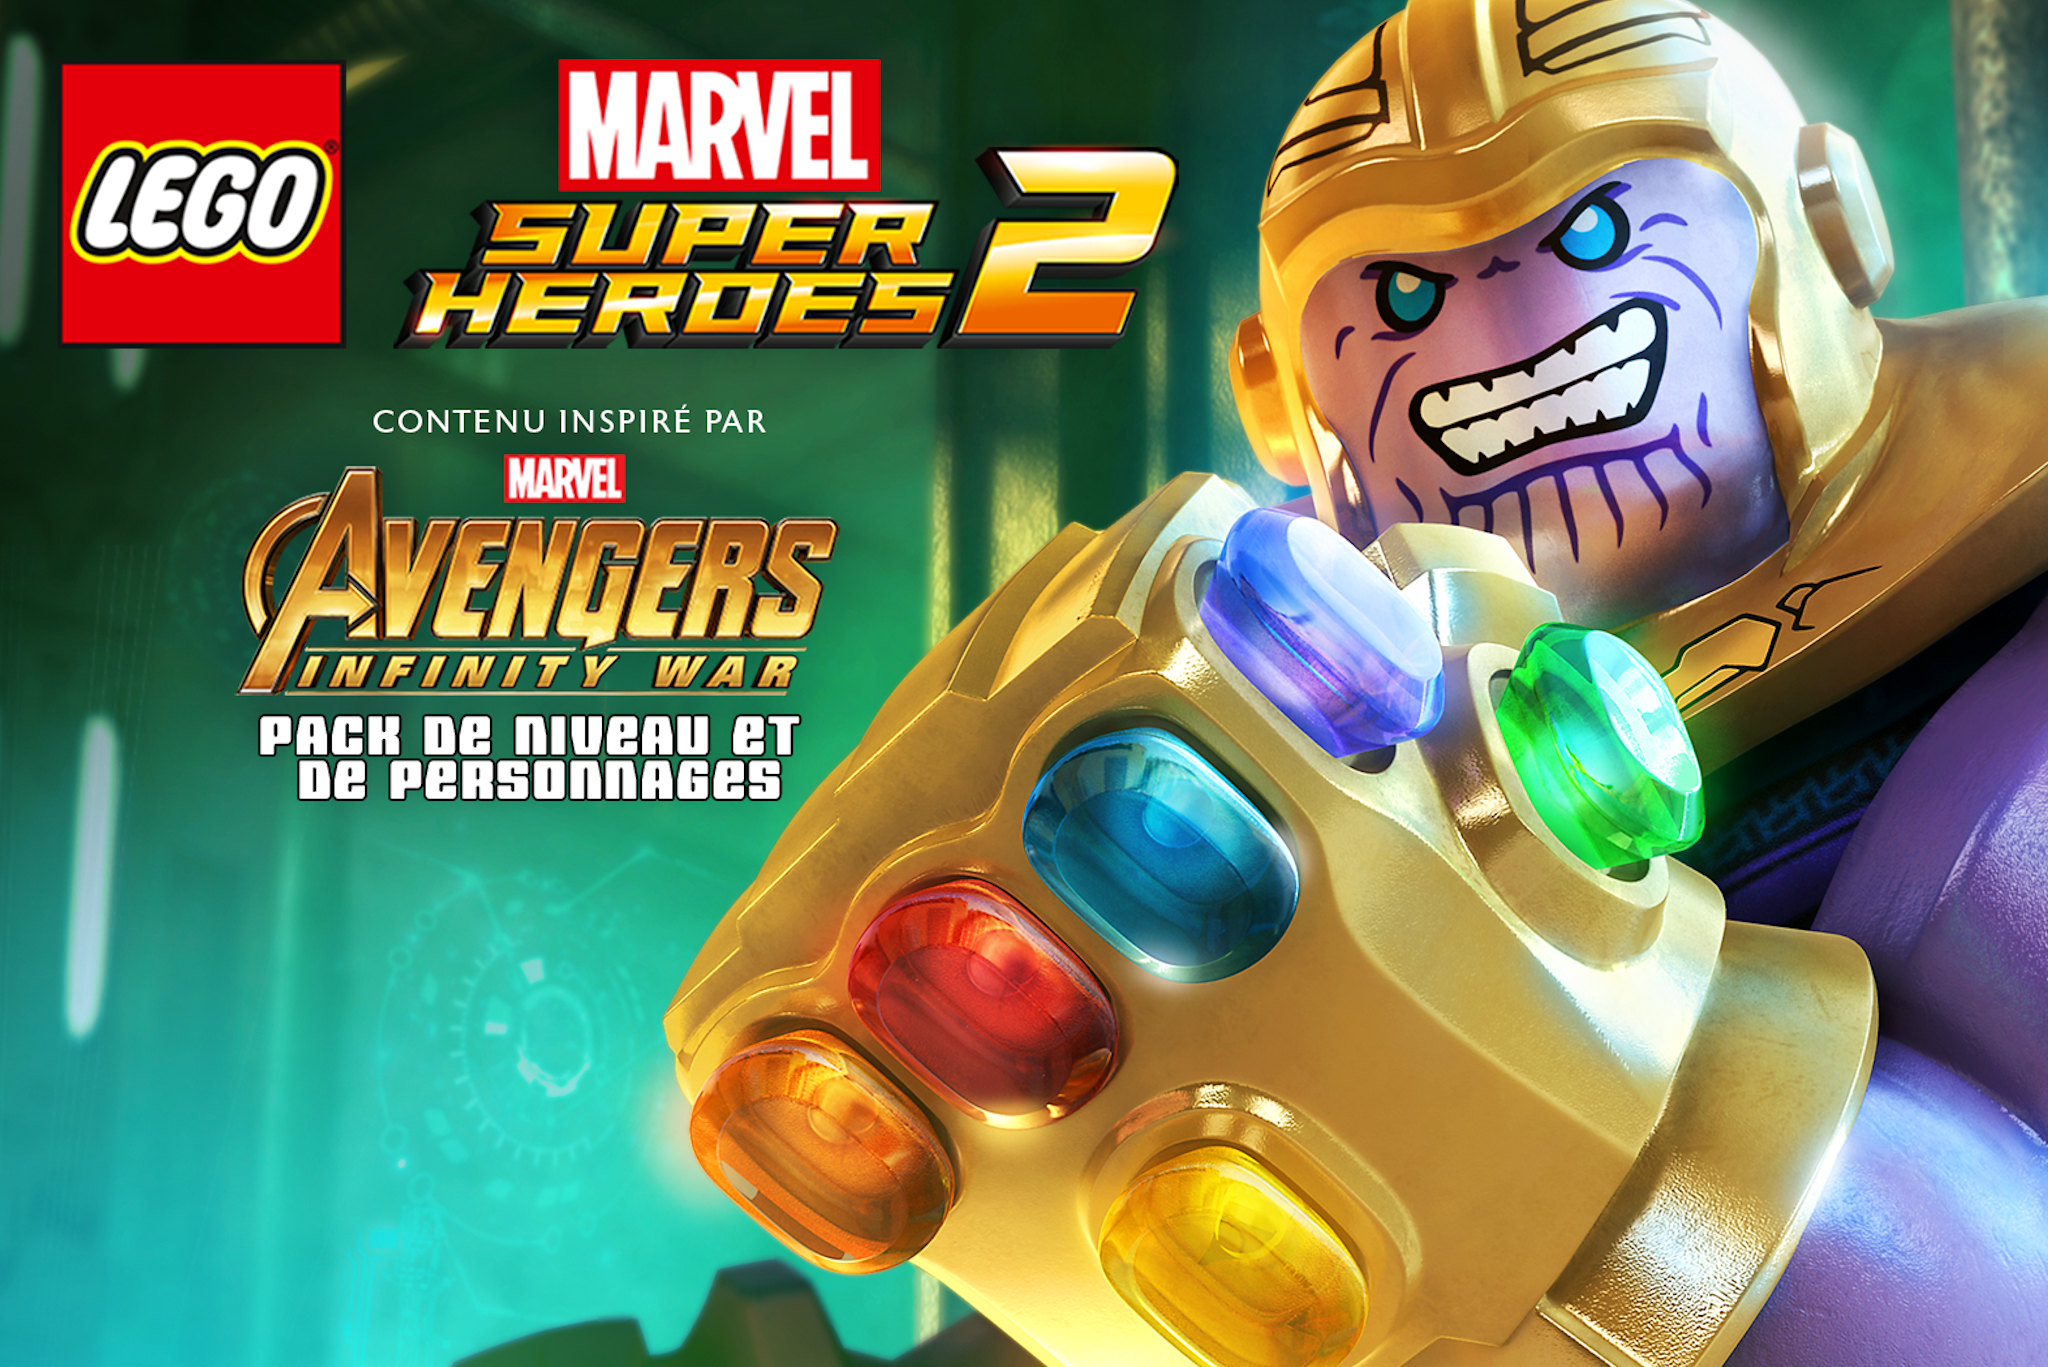 LEGO Marvel Super Heroes 2: Los Vengadores: Infinity War